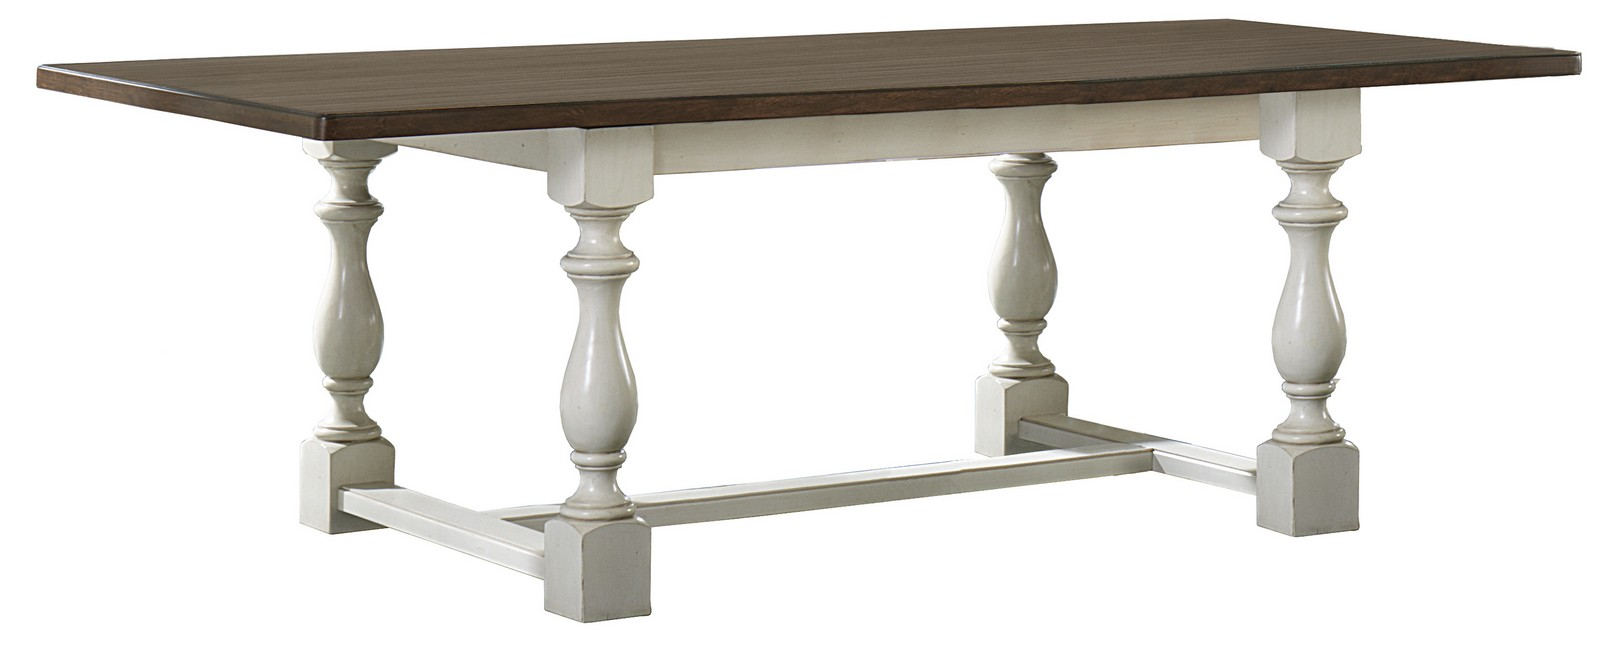 Captivating Hillsdale Pine Island Leg Trestle Table   Old White